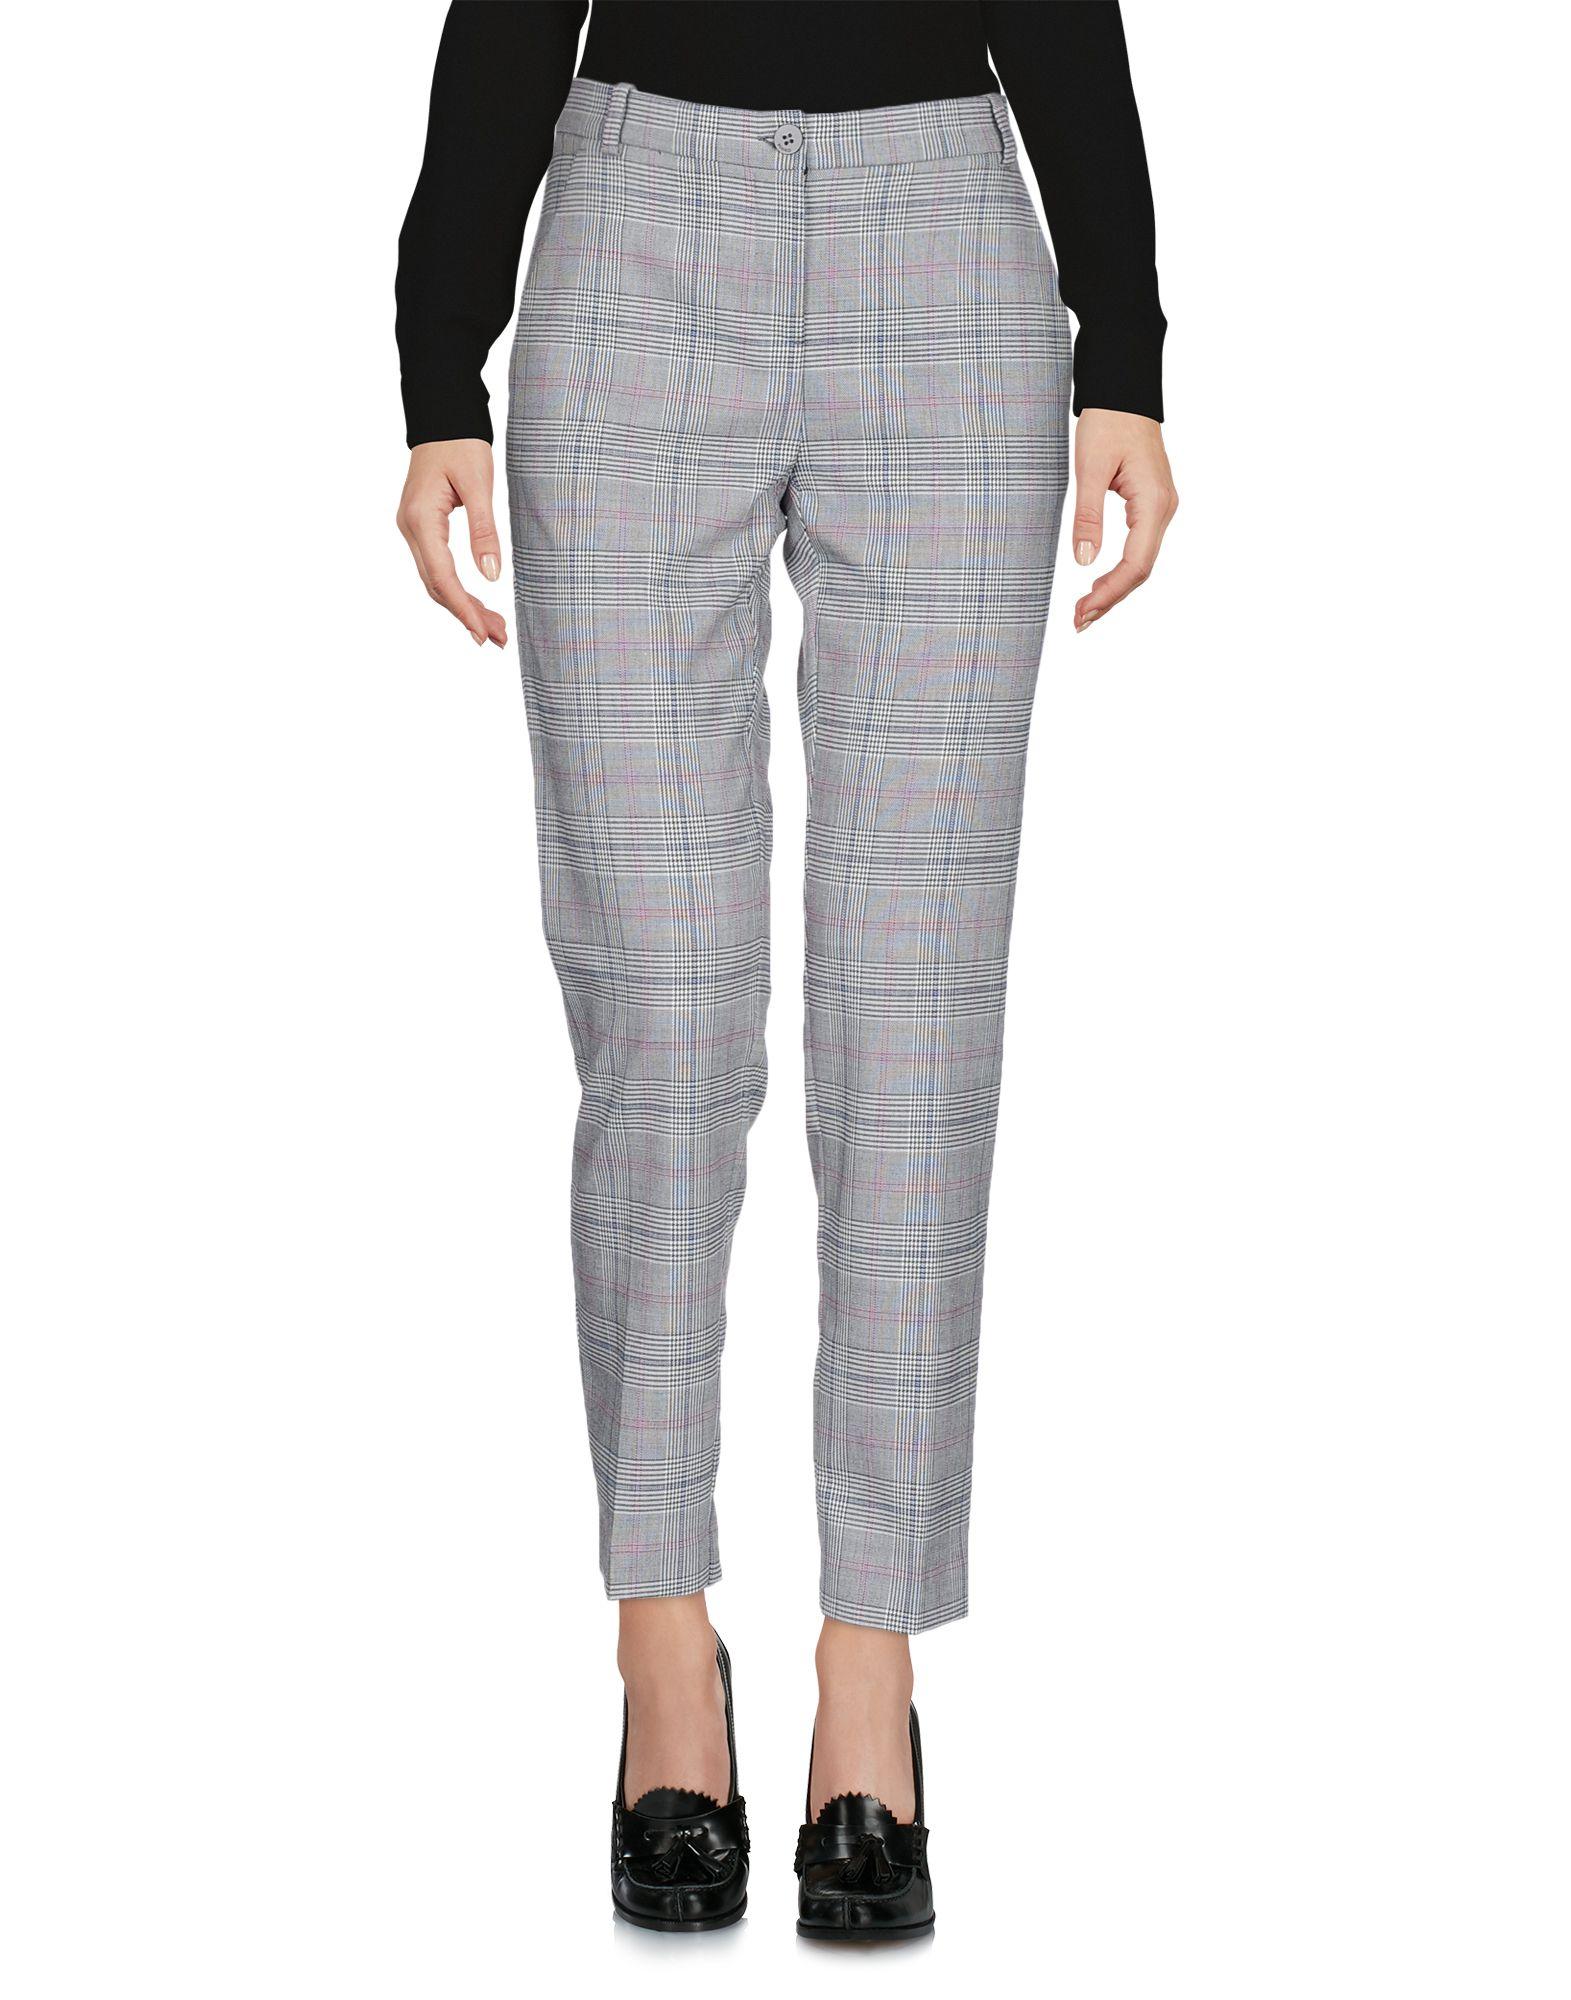 Pantalone Pinko Donna - Acquista online su TIxNd5